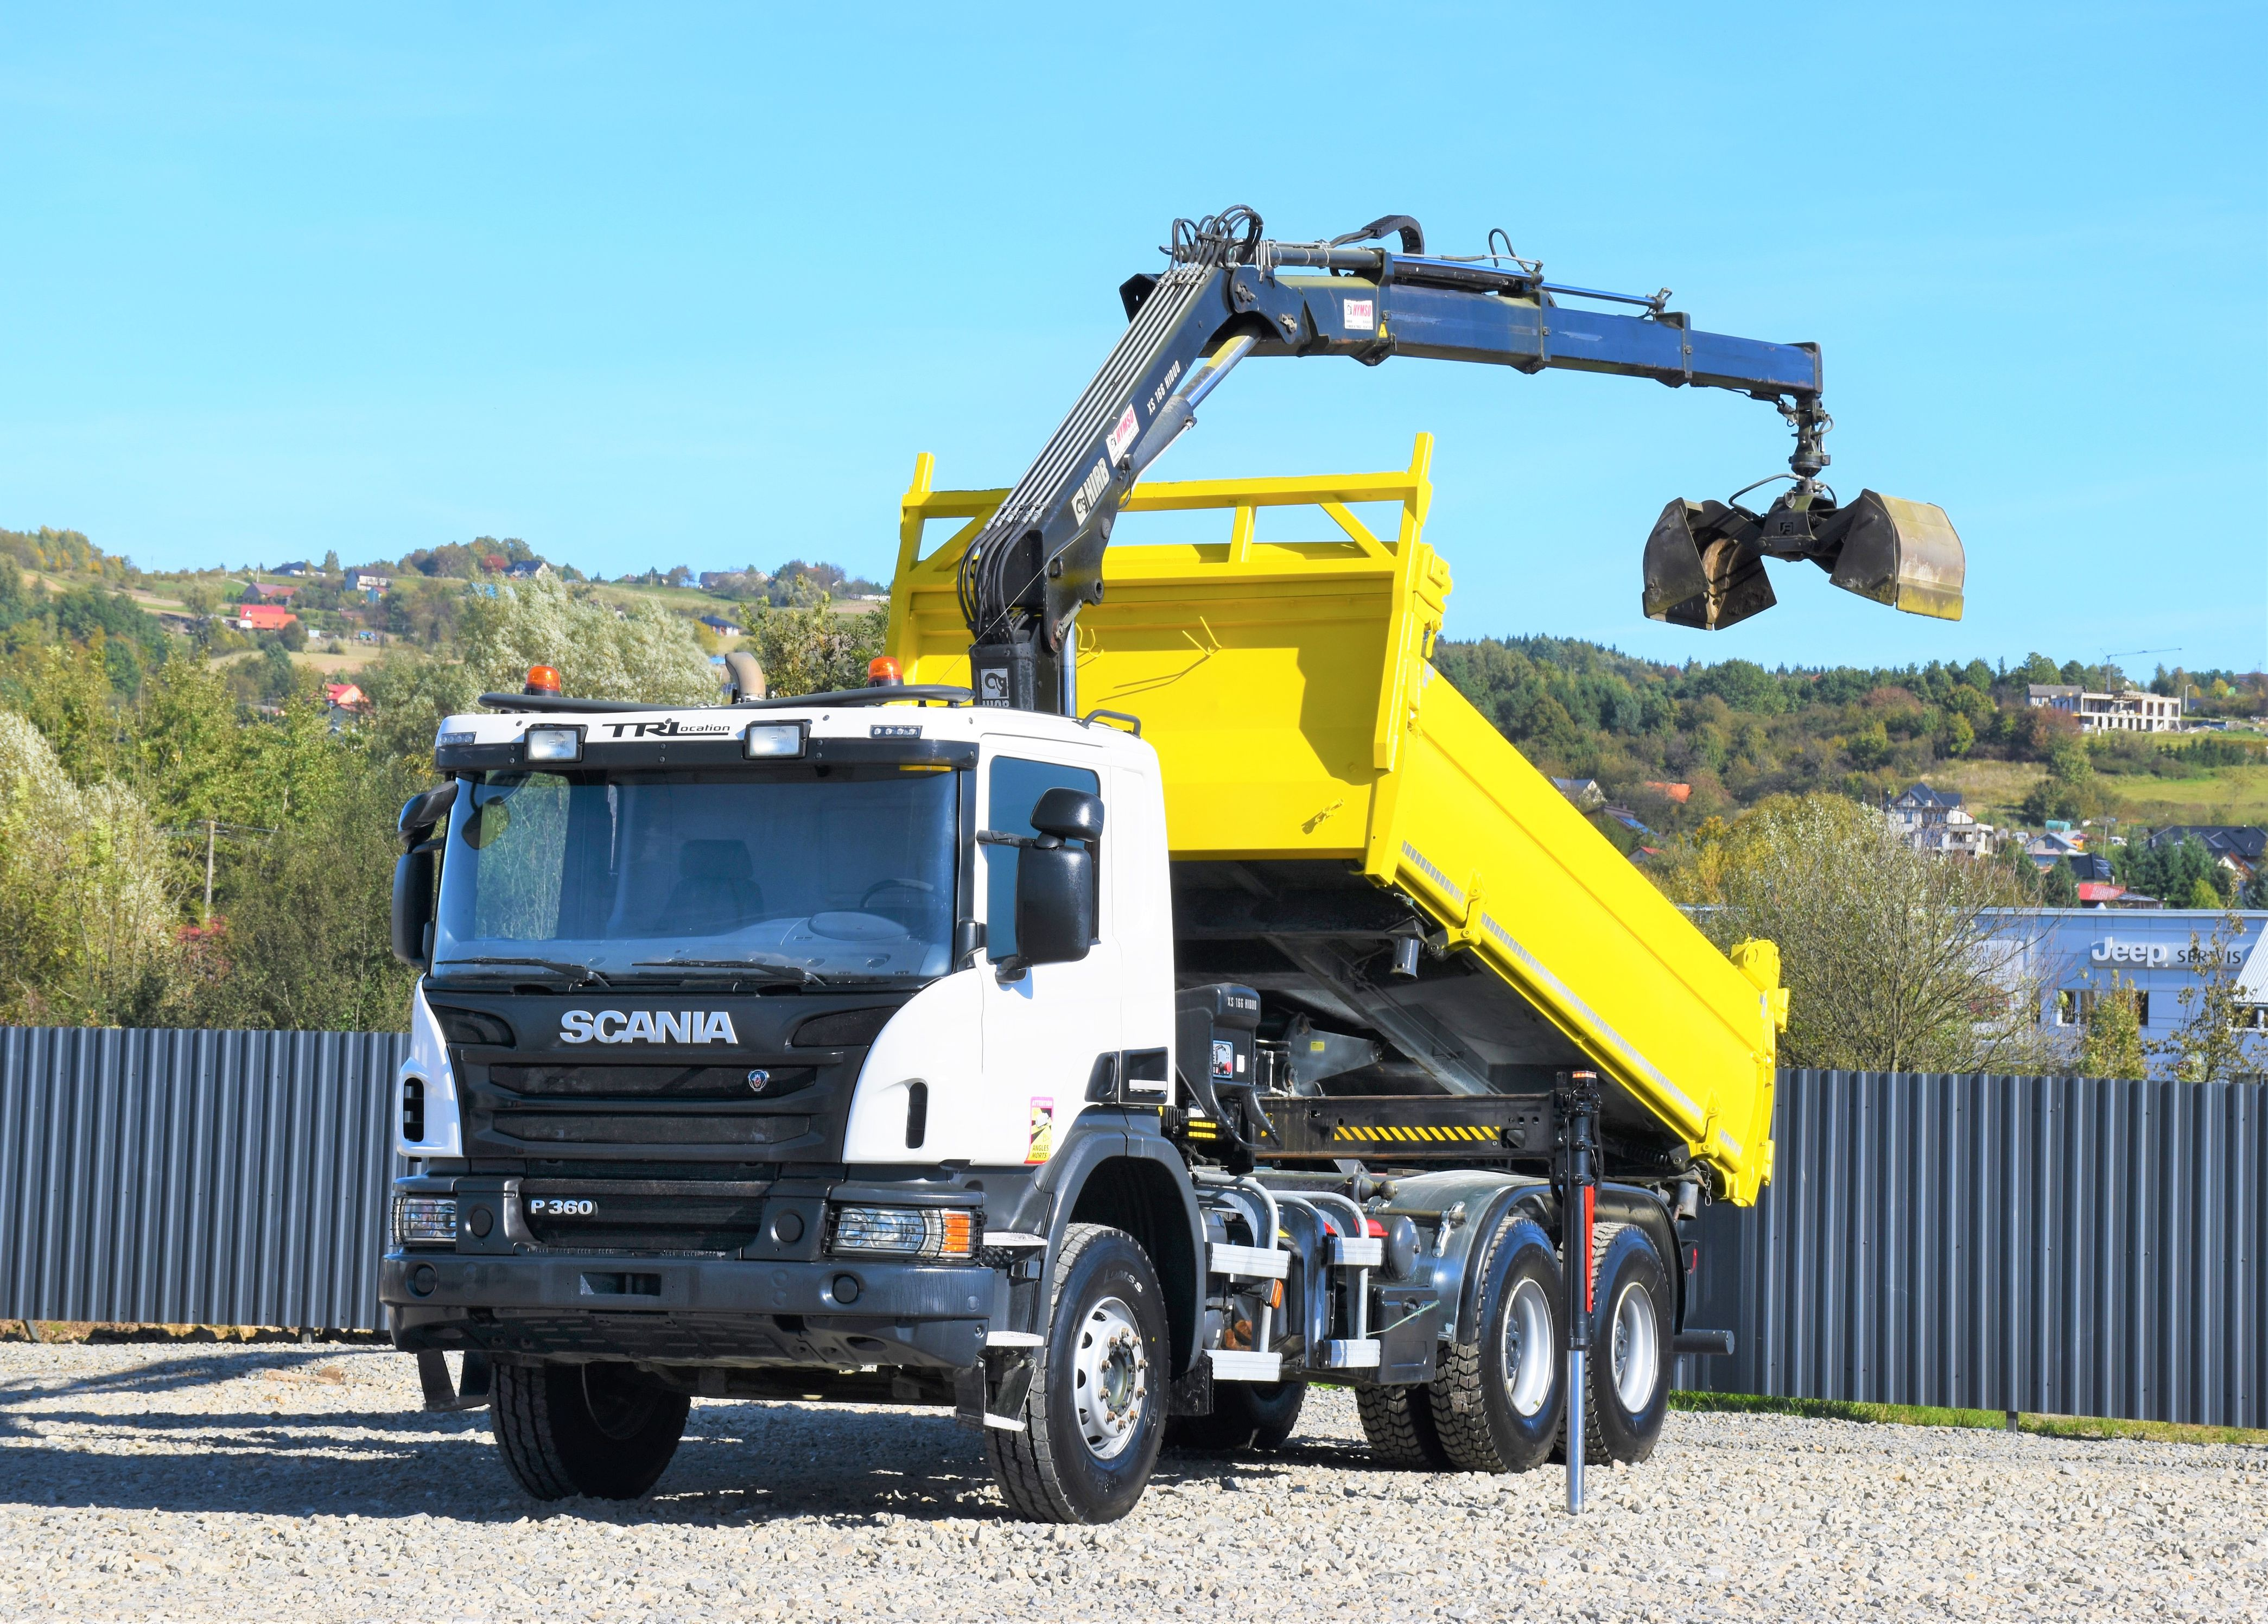 2014-scania-p360-460870-equipment-cover-image